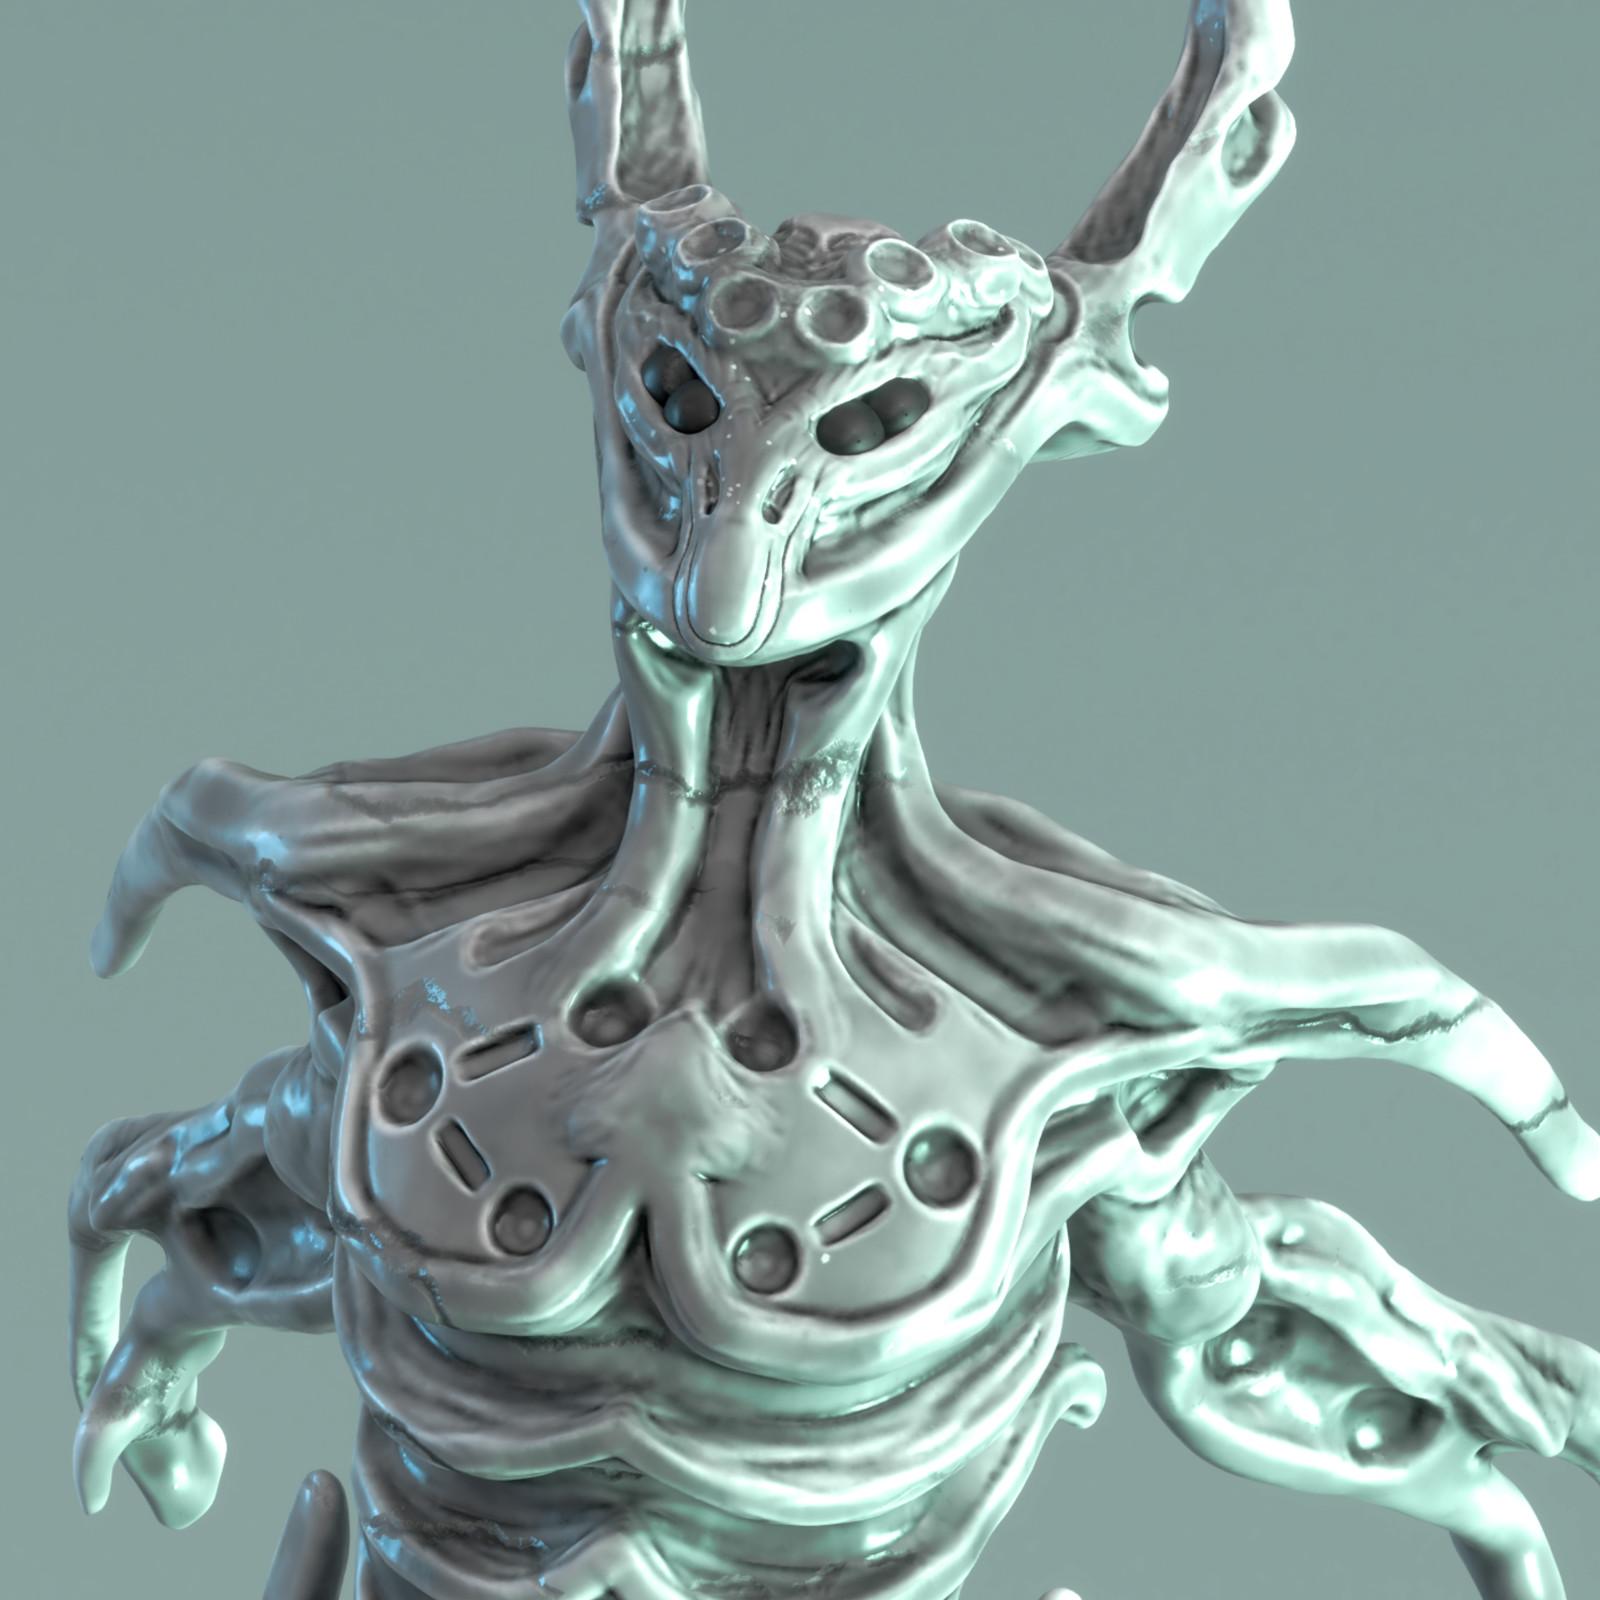 Sculpt January 2018 - Day 6: Monster